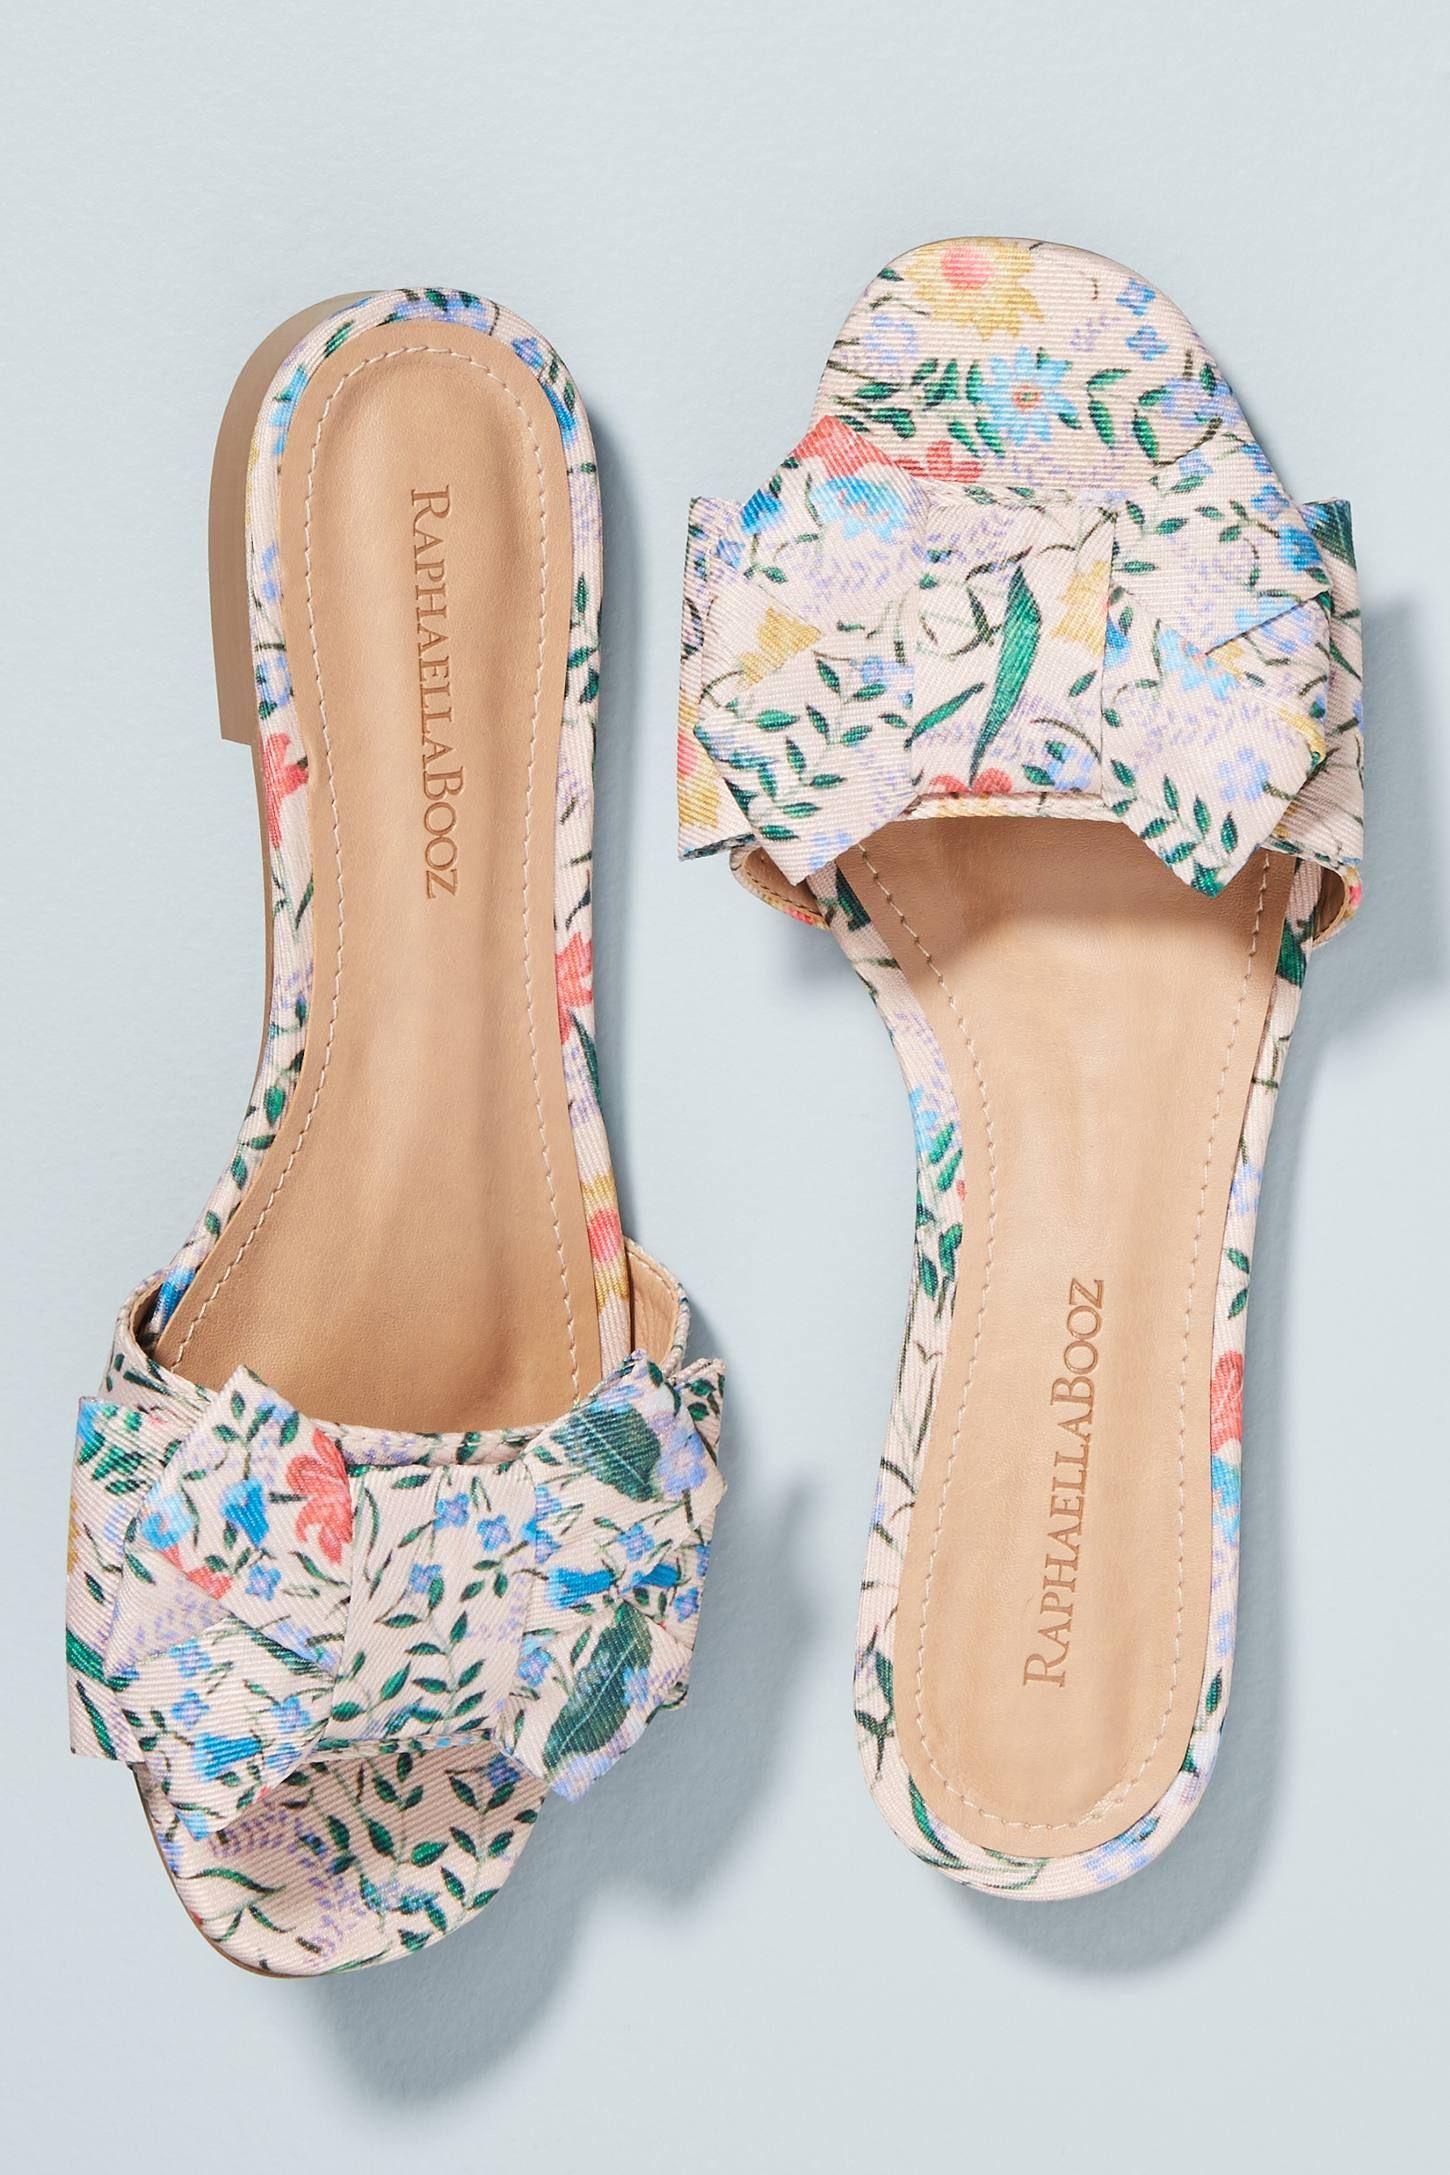 a61ff79c2d2 Raphaella Booz Bow-Front Slide Sandals